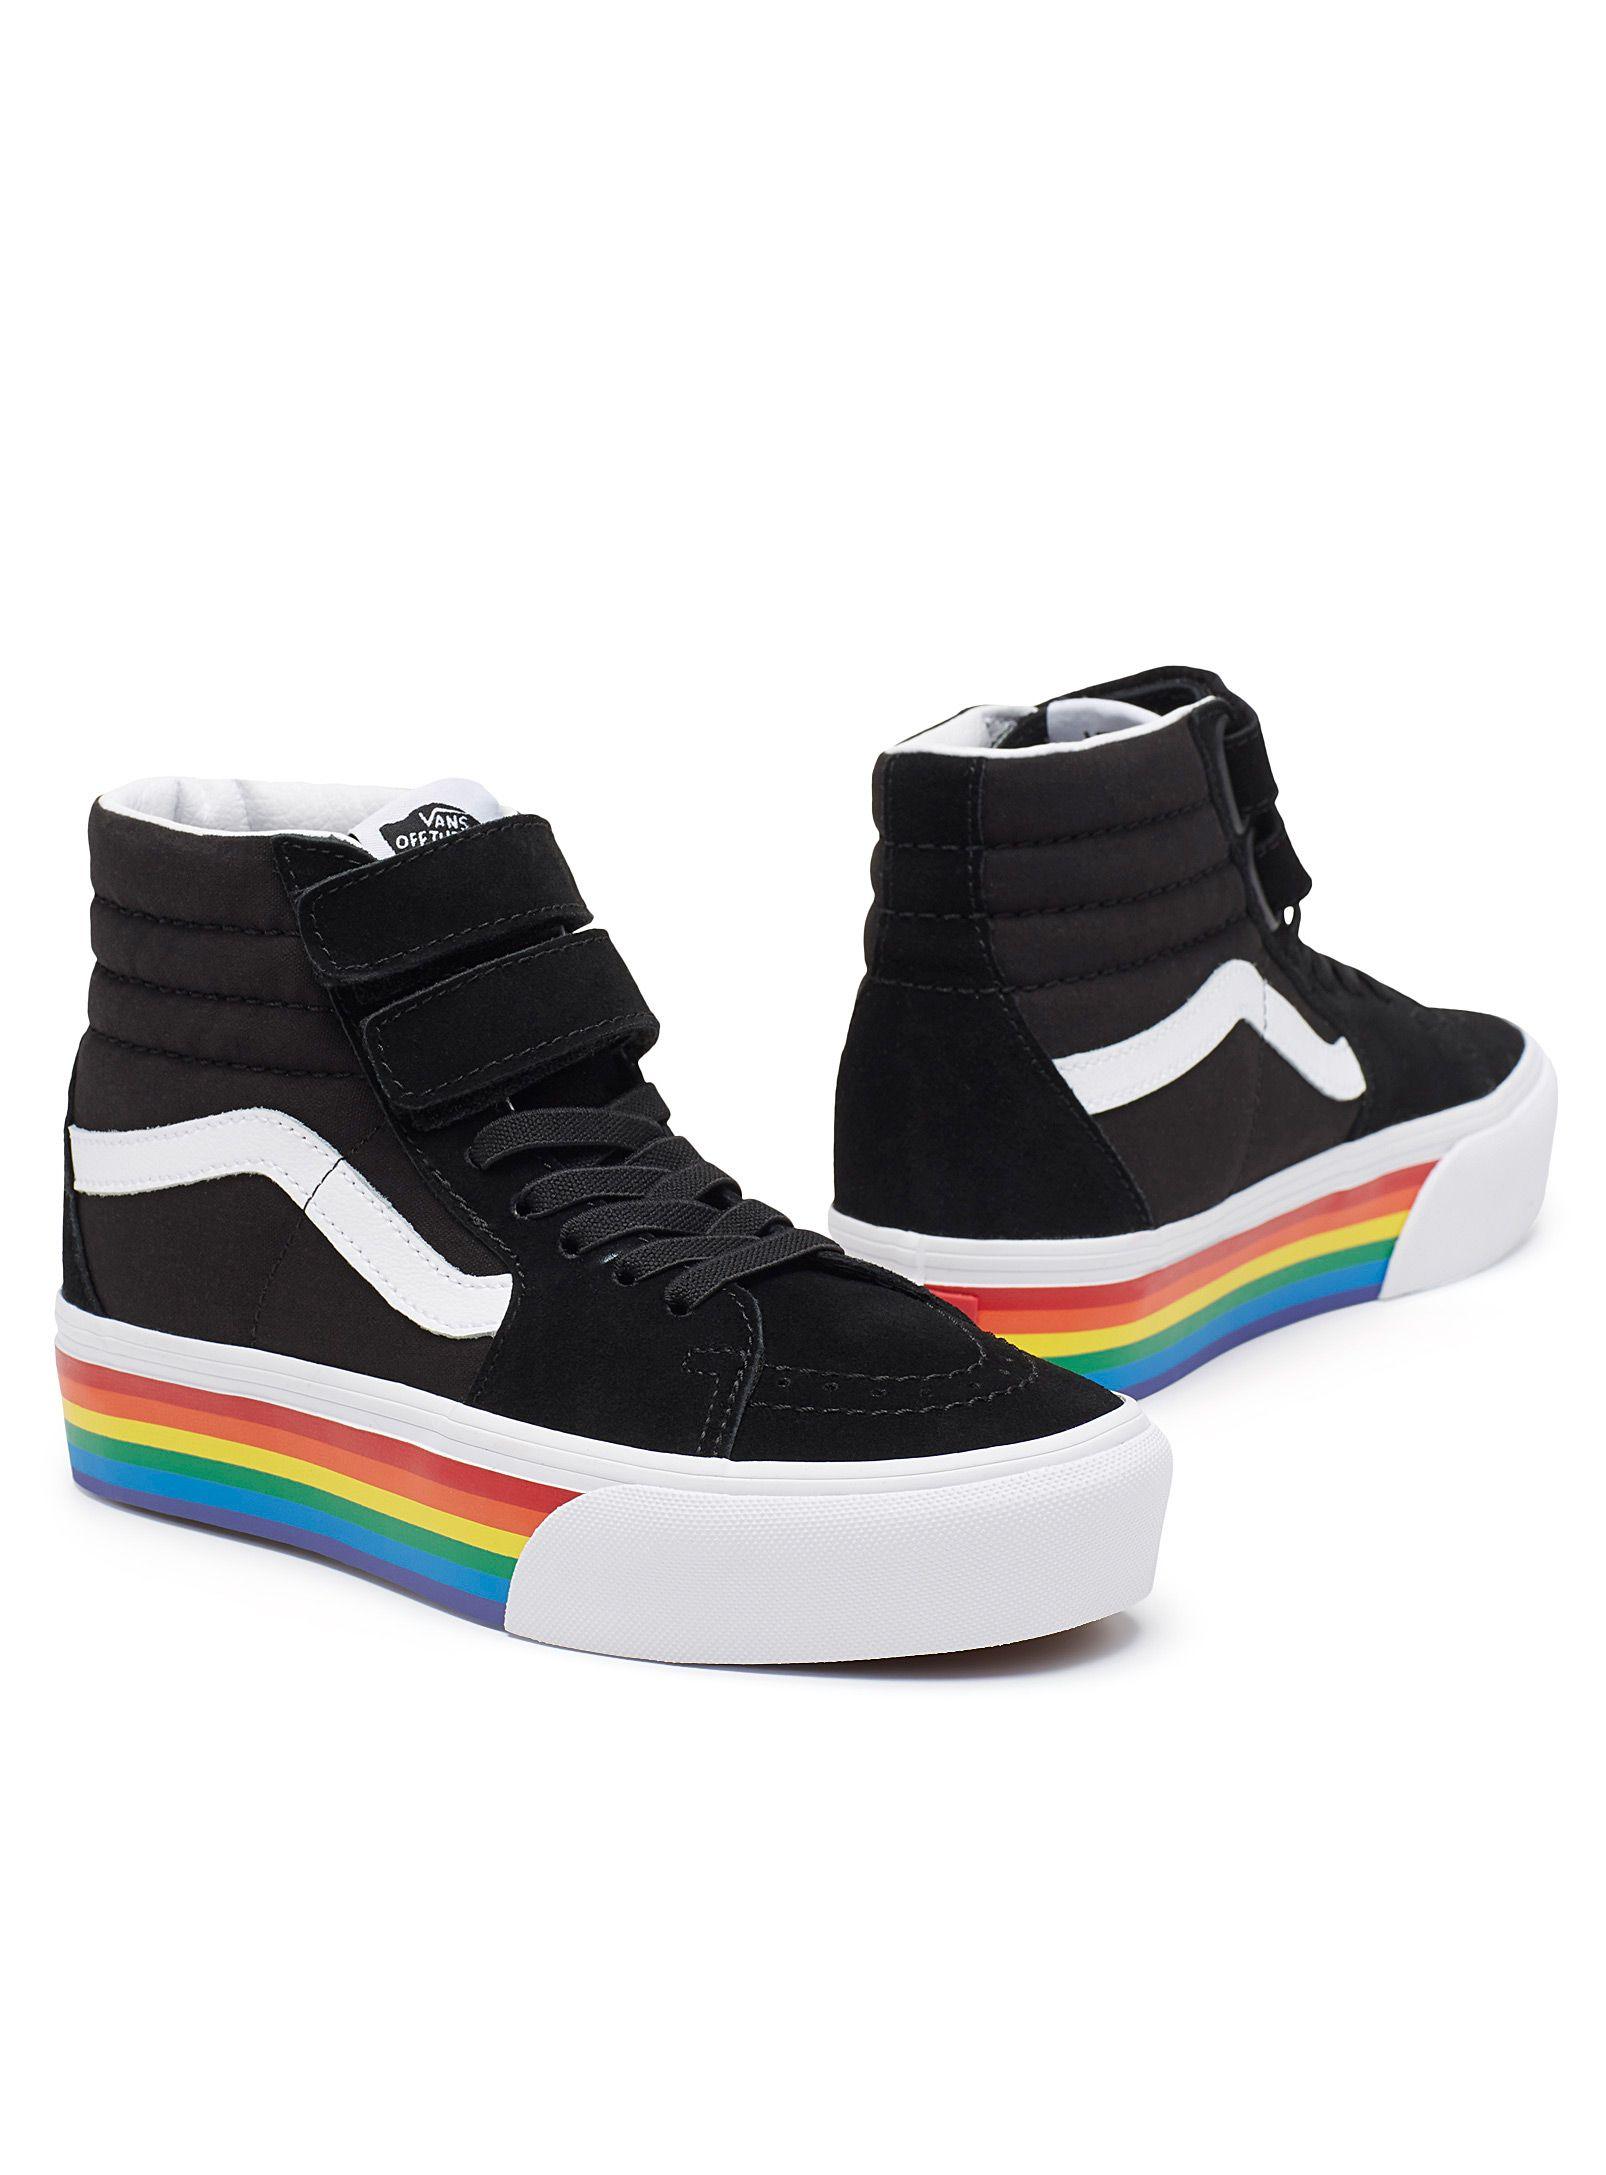 Vans | Rainbow Sk8 Hi V Platform sneakers Women | Rainbow